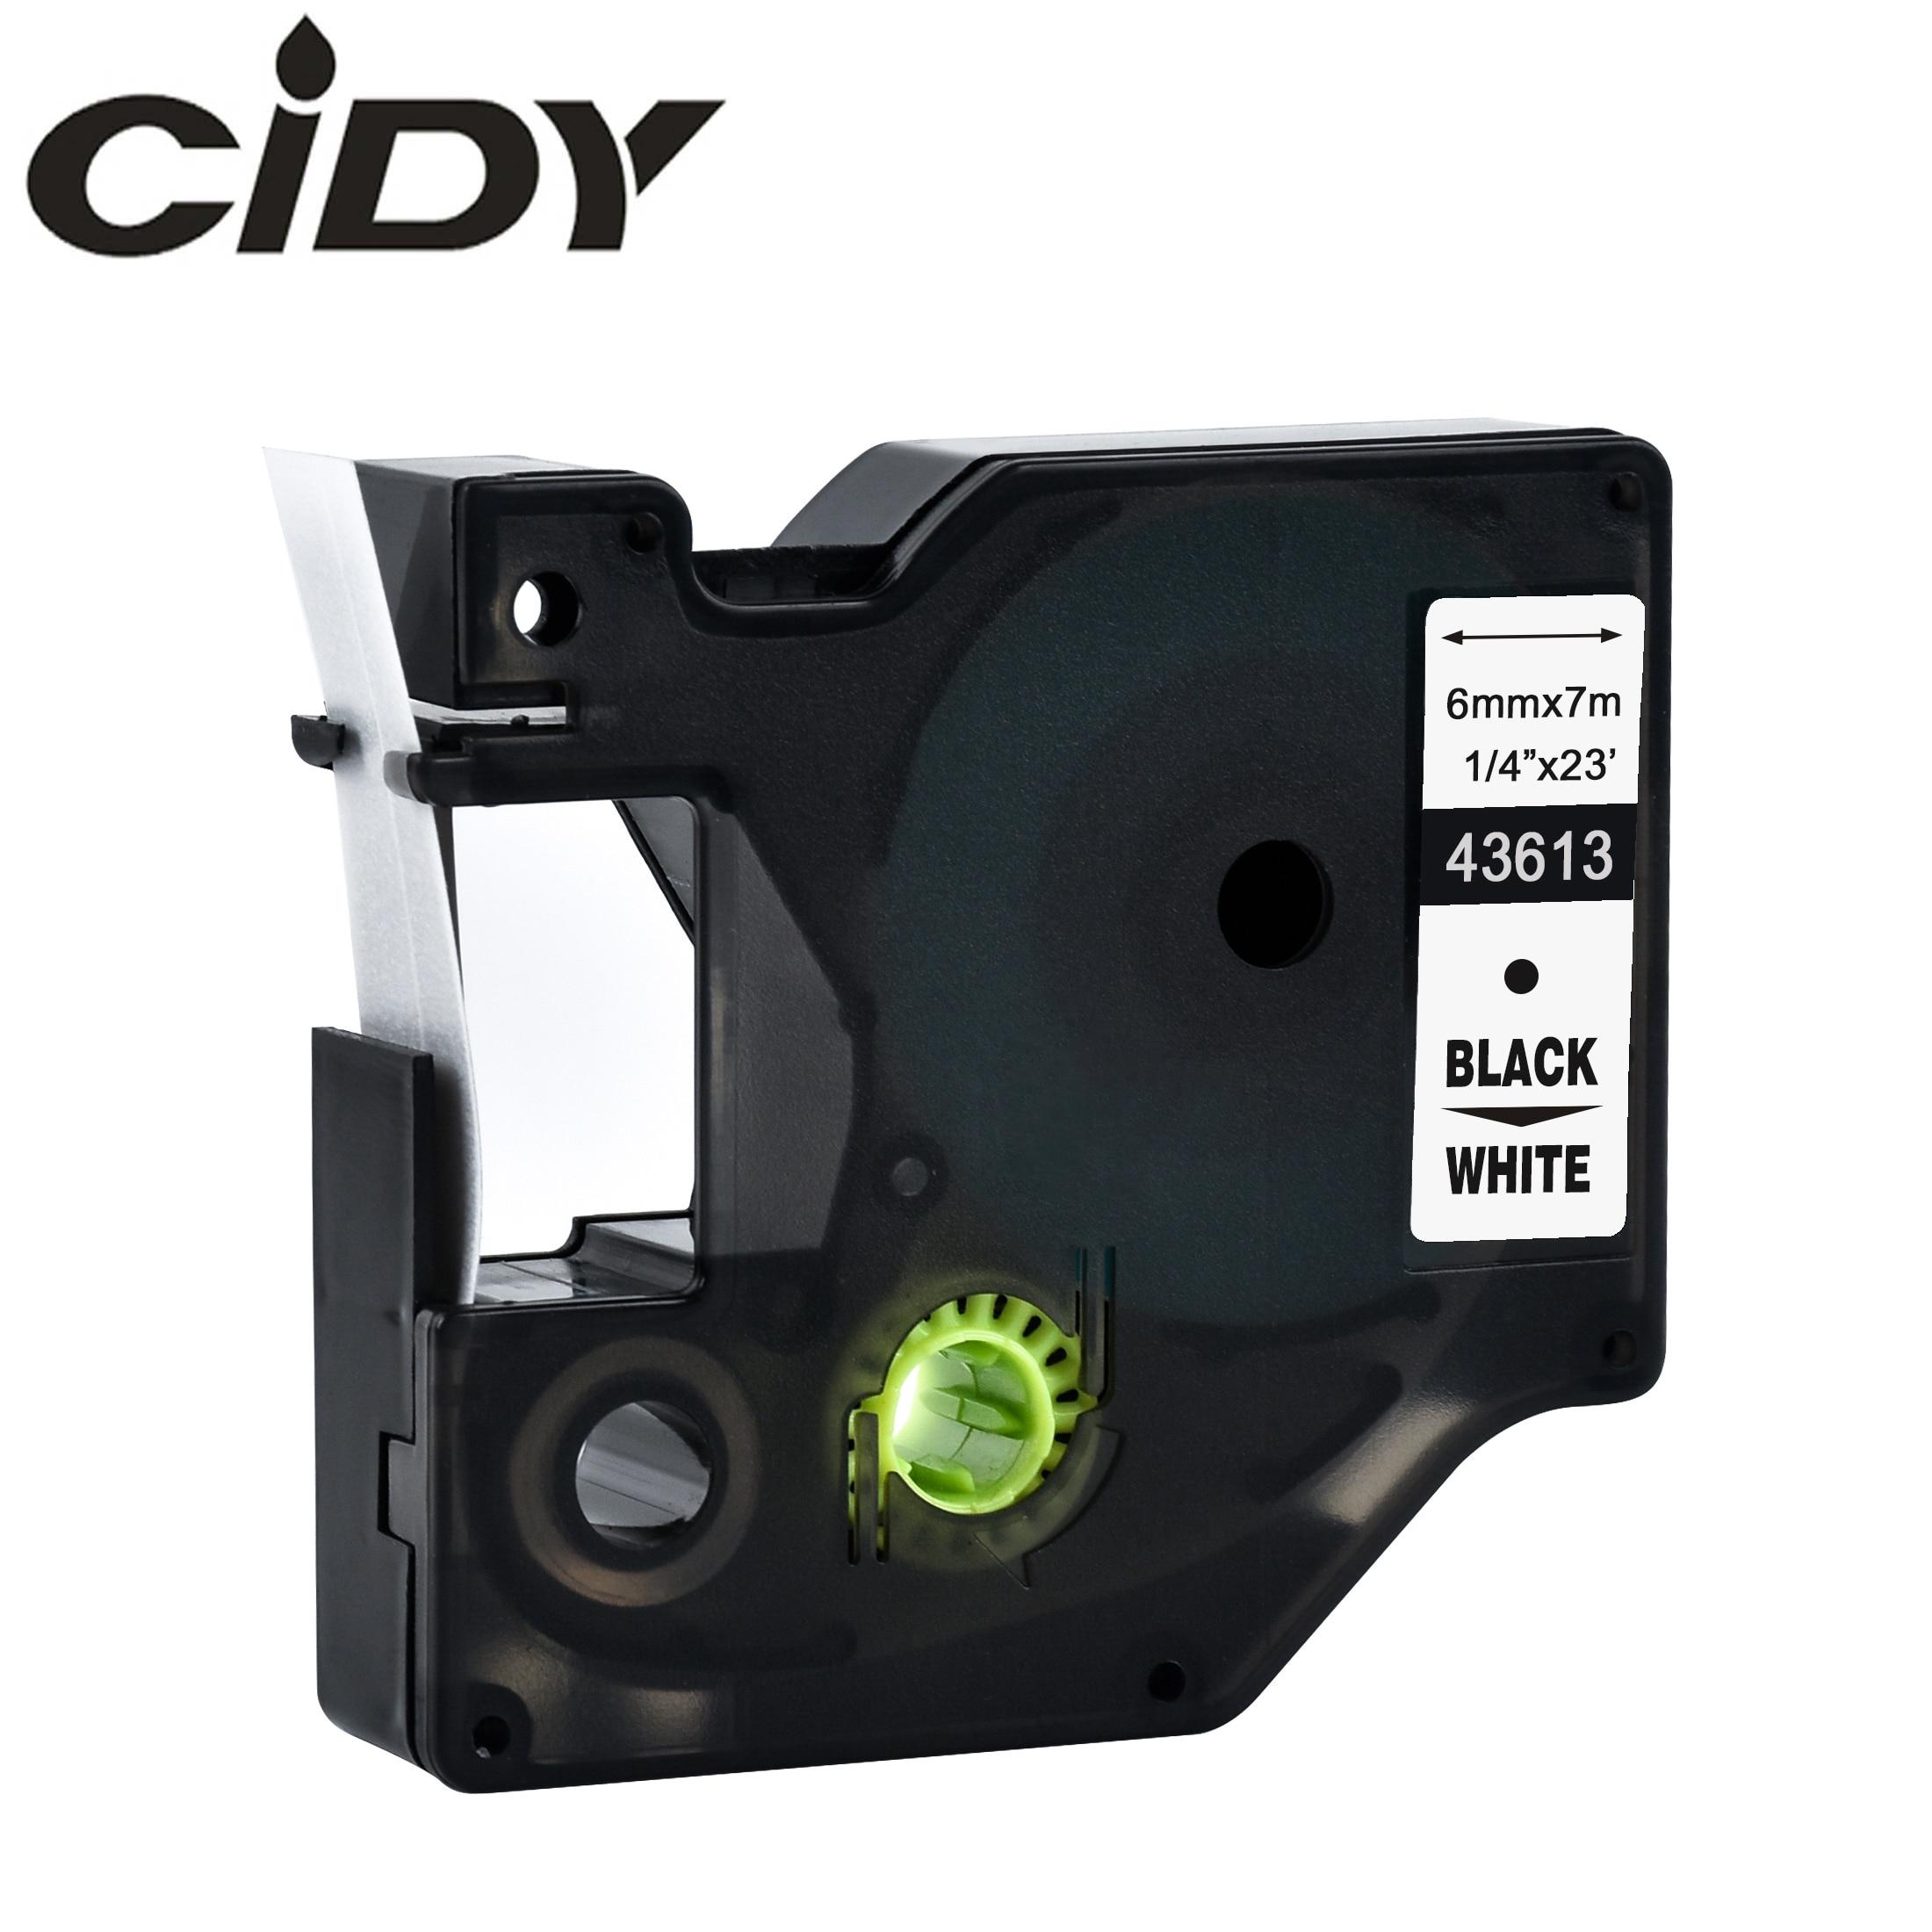 CIDY 1 Uds DYMO compatible D1 6 cinta de etiquetas mm 43613, 43610, 43618, negro sobre blanco, cintas para etiquetas para Administrador de etiquetas DYMO 160, 280, 210